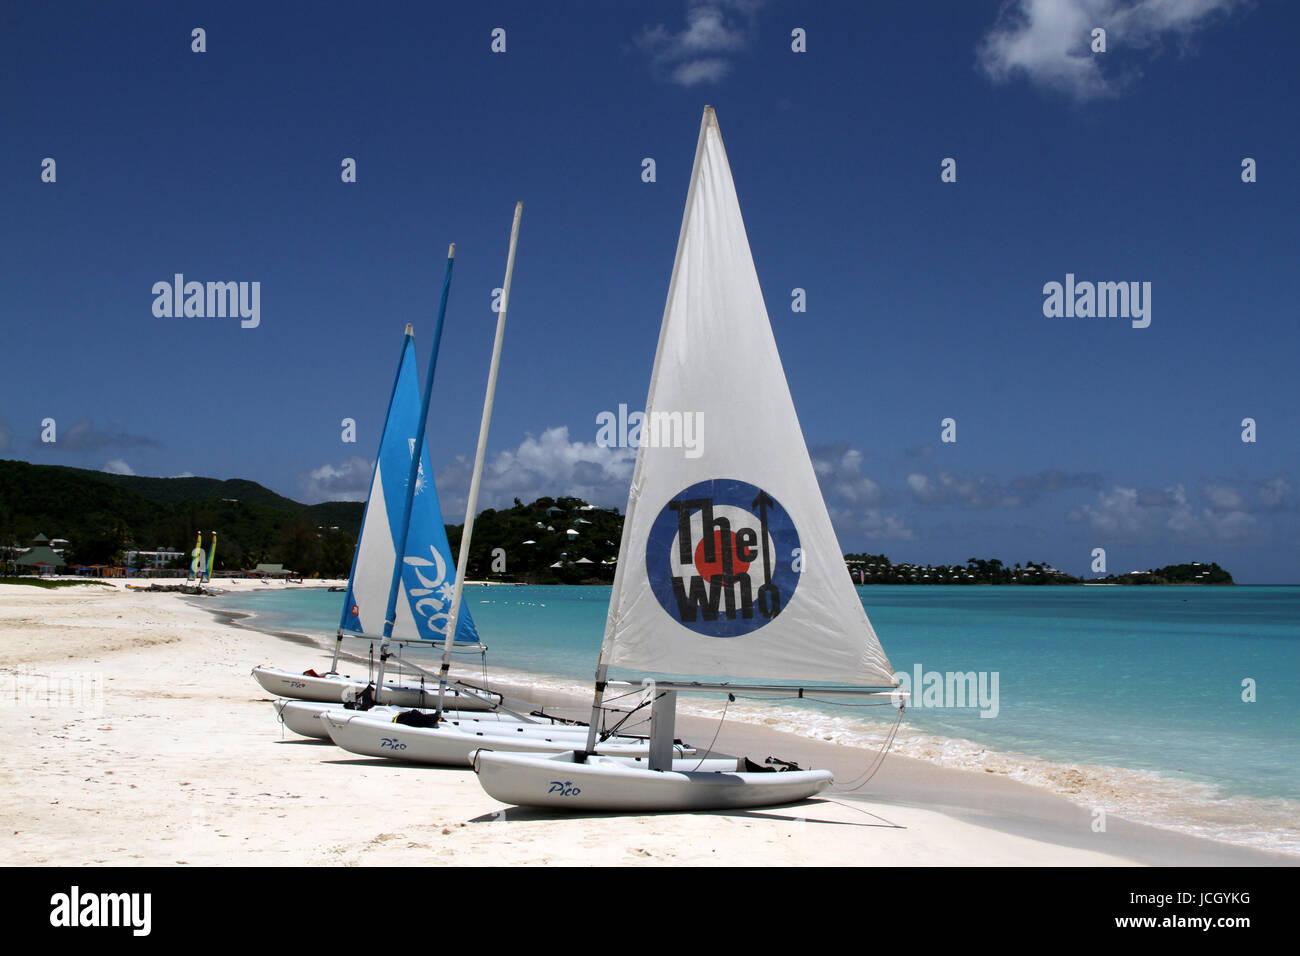 Falmouth Superyacht Dock, Antigua - Stock Image